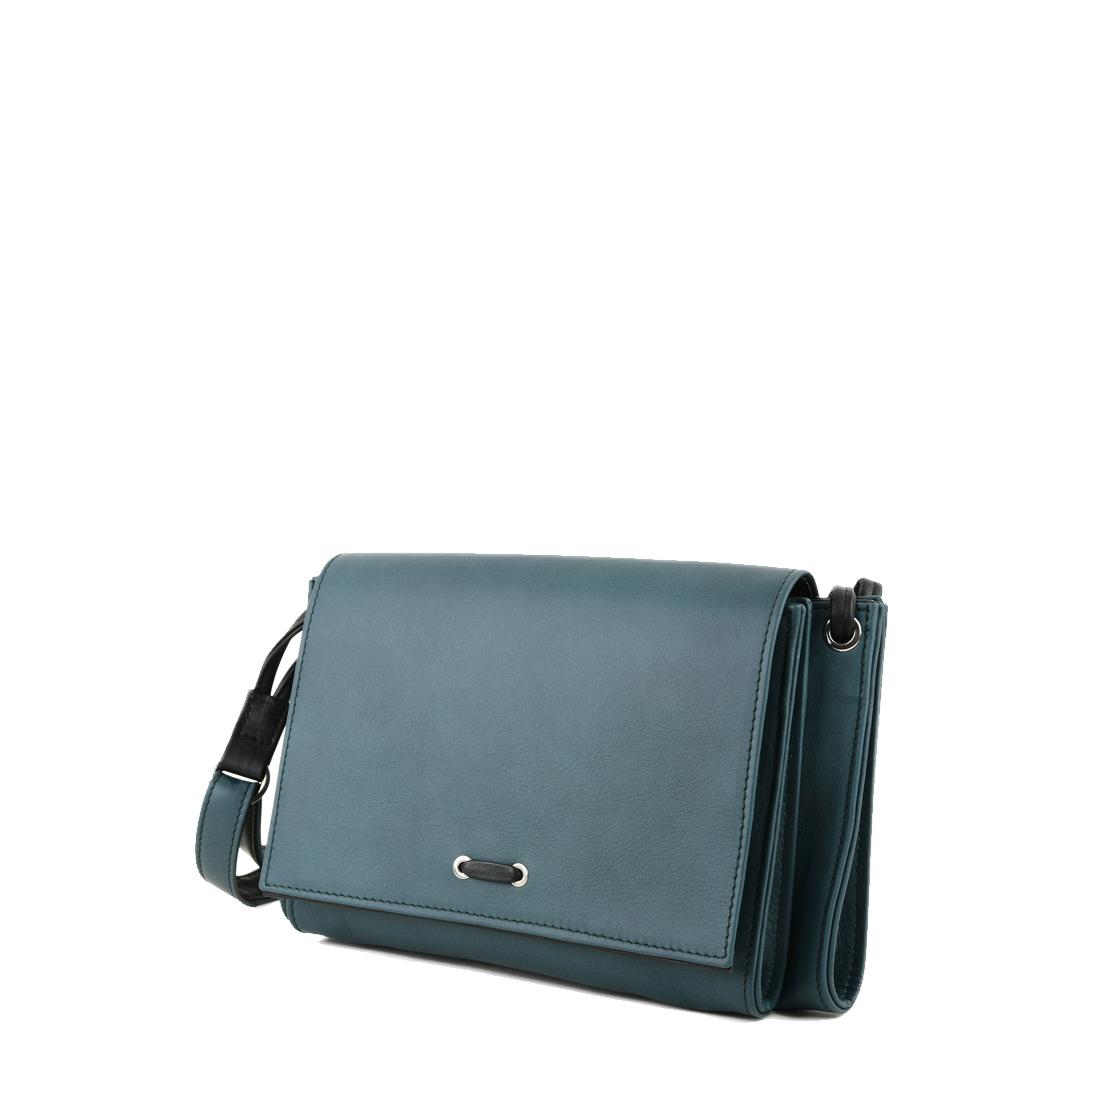 Isobel Teal Leather Across Body Bag